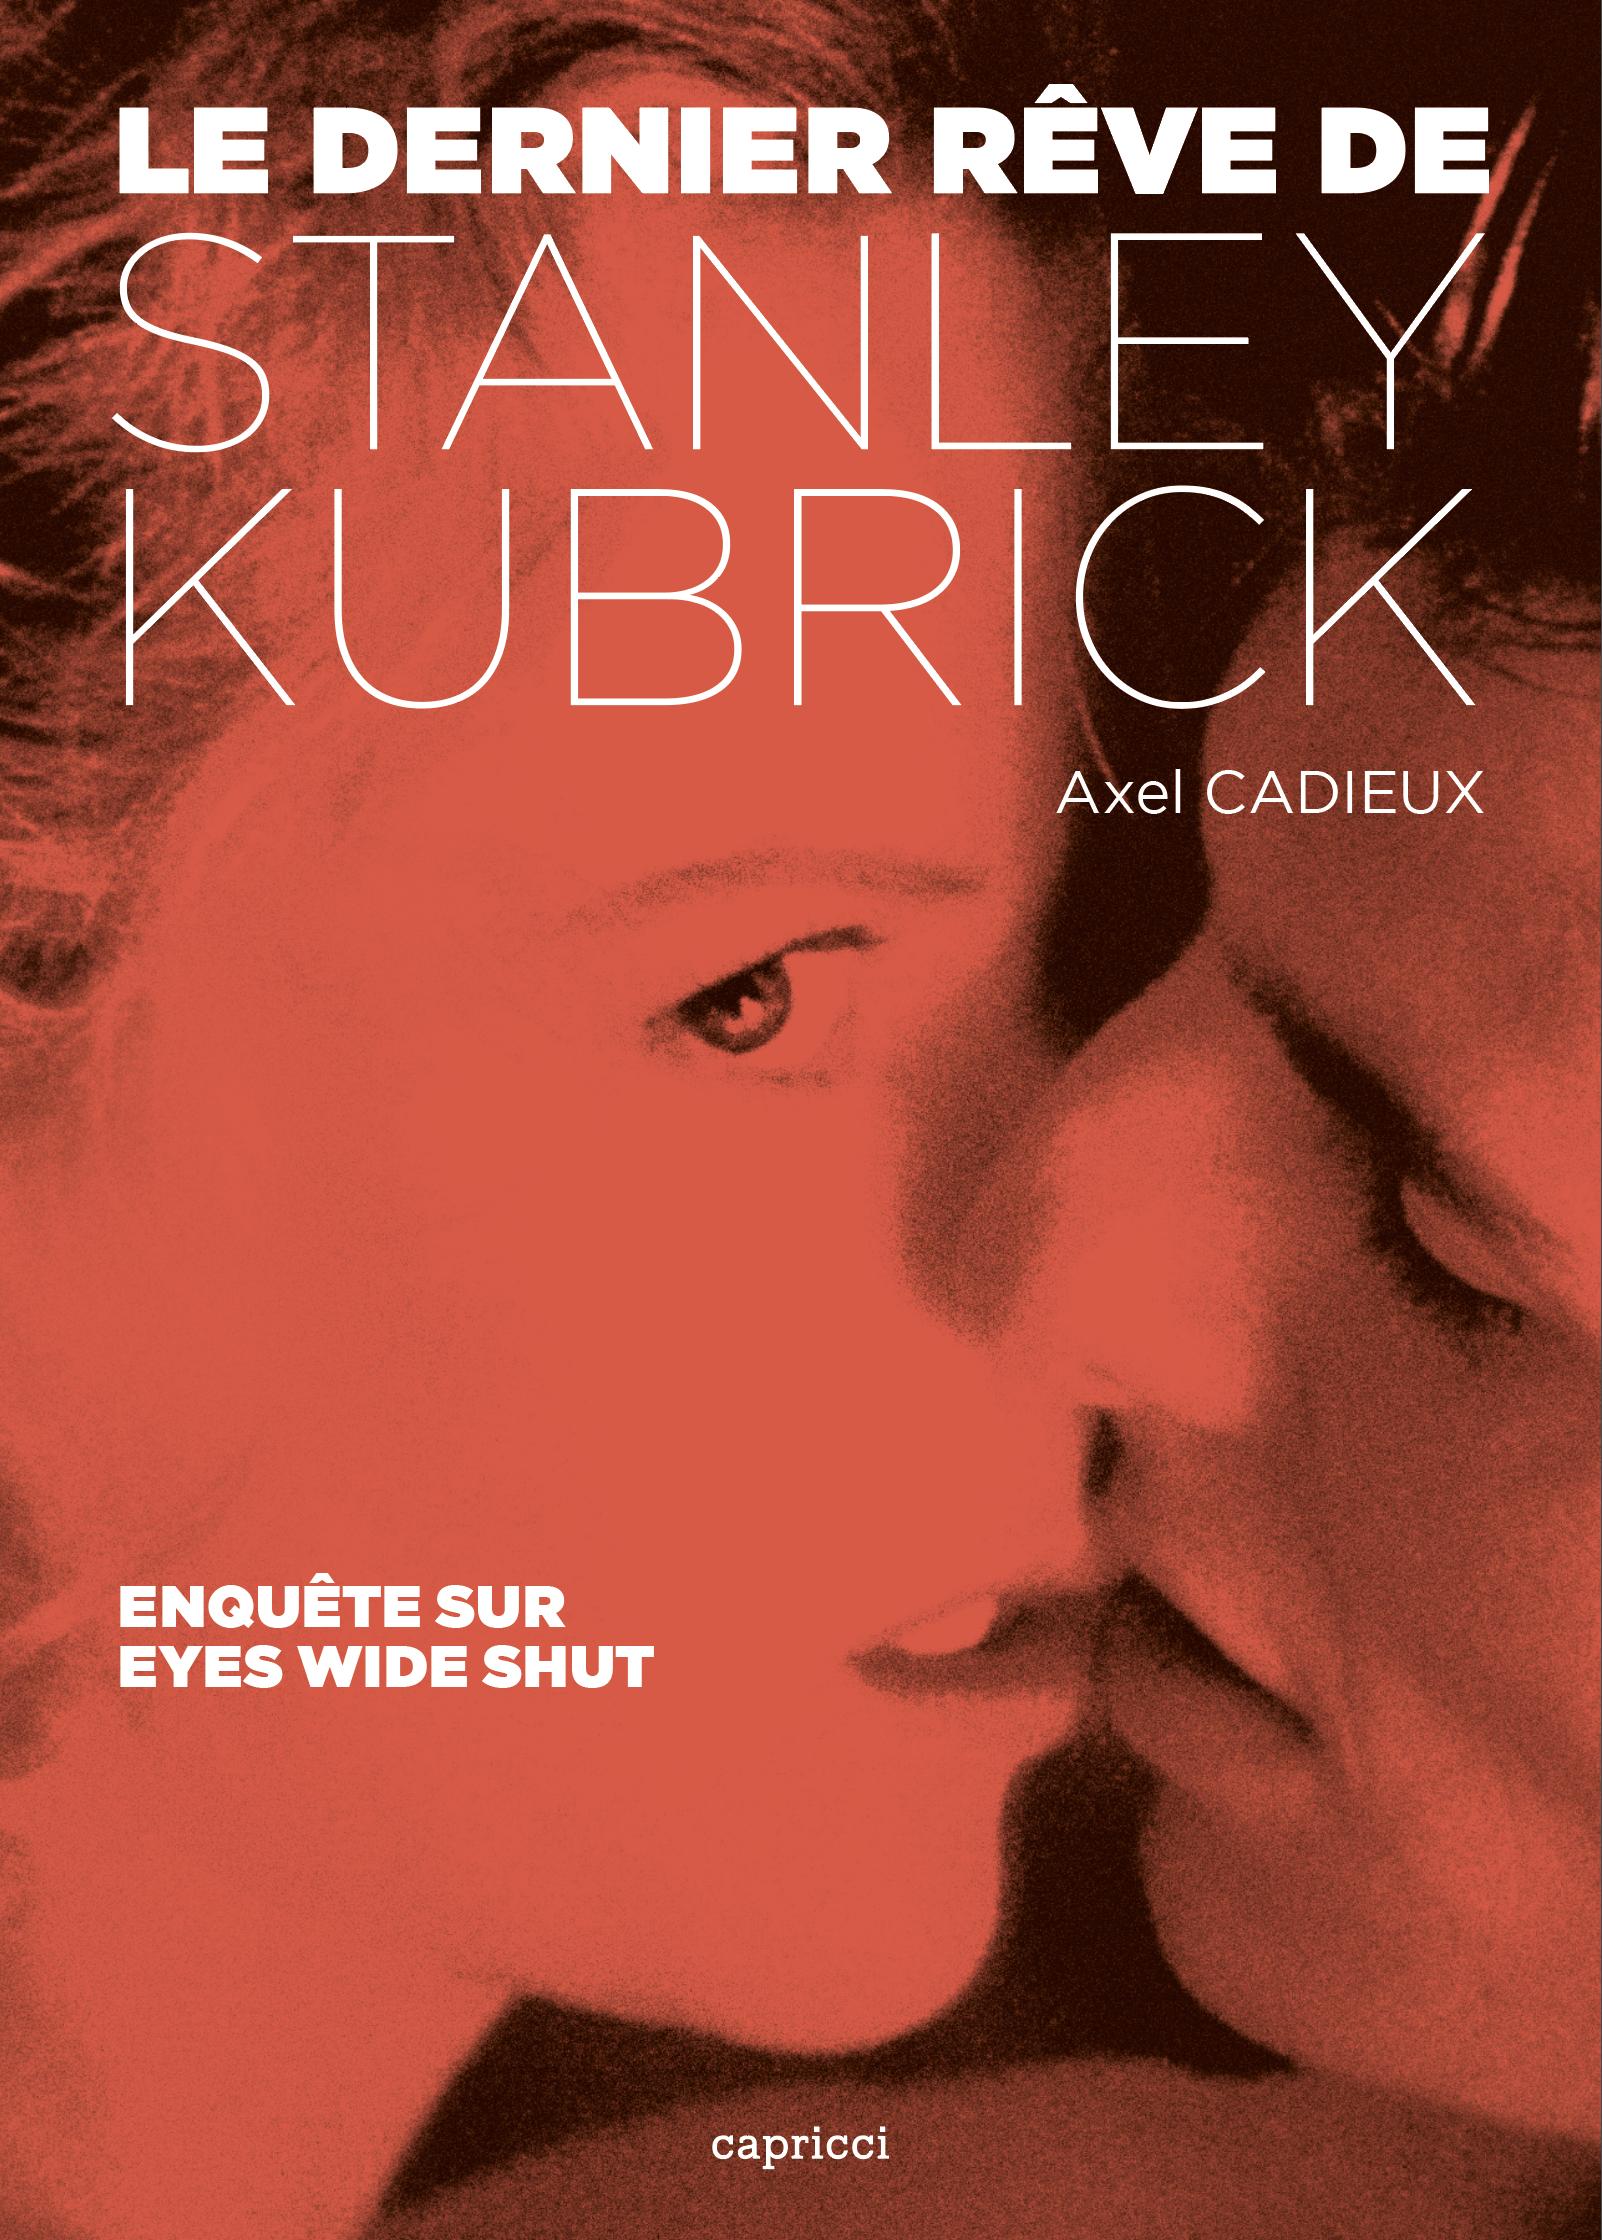 Le Dernier Rêve de Stanley Kubrick